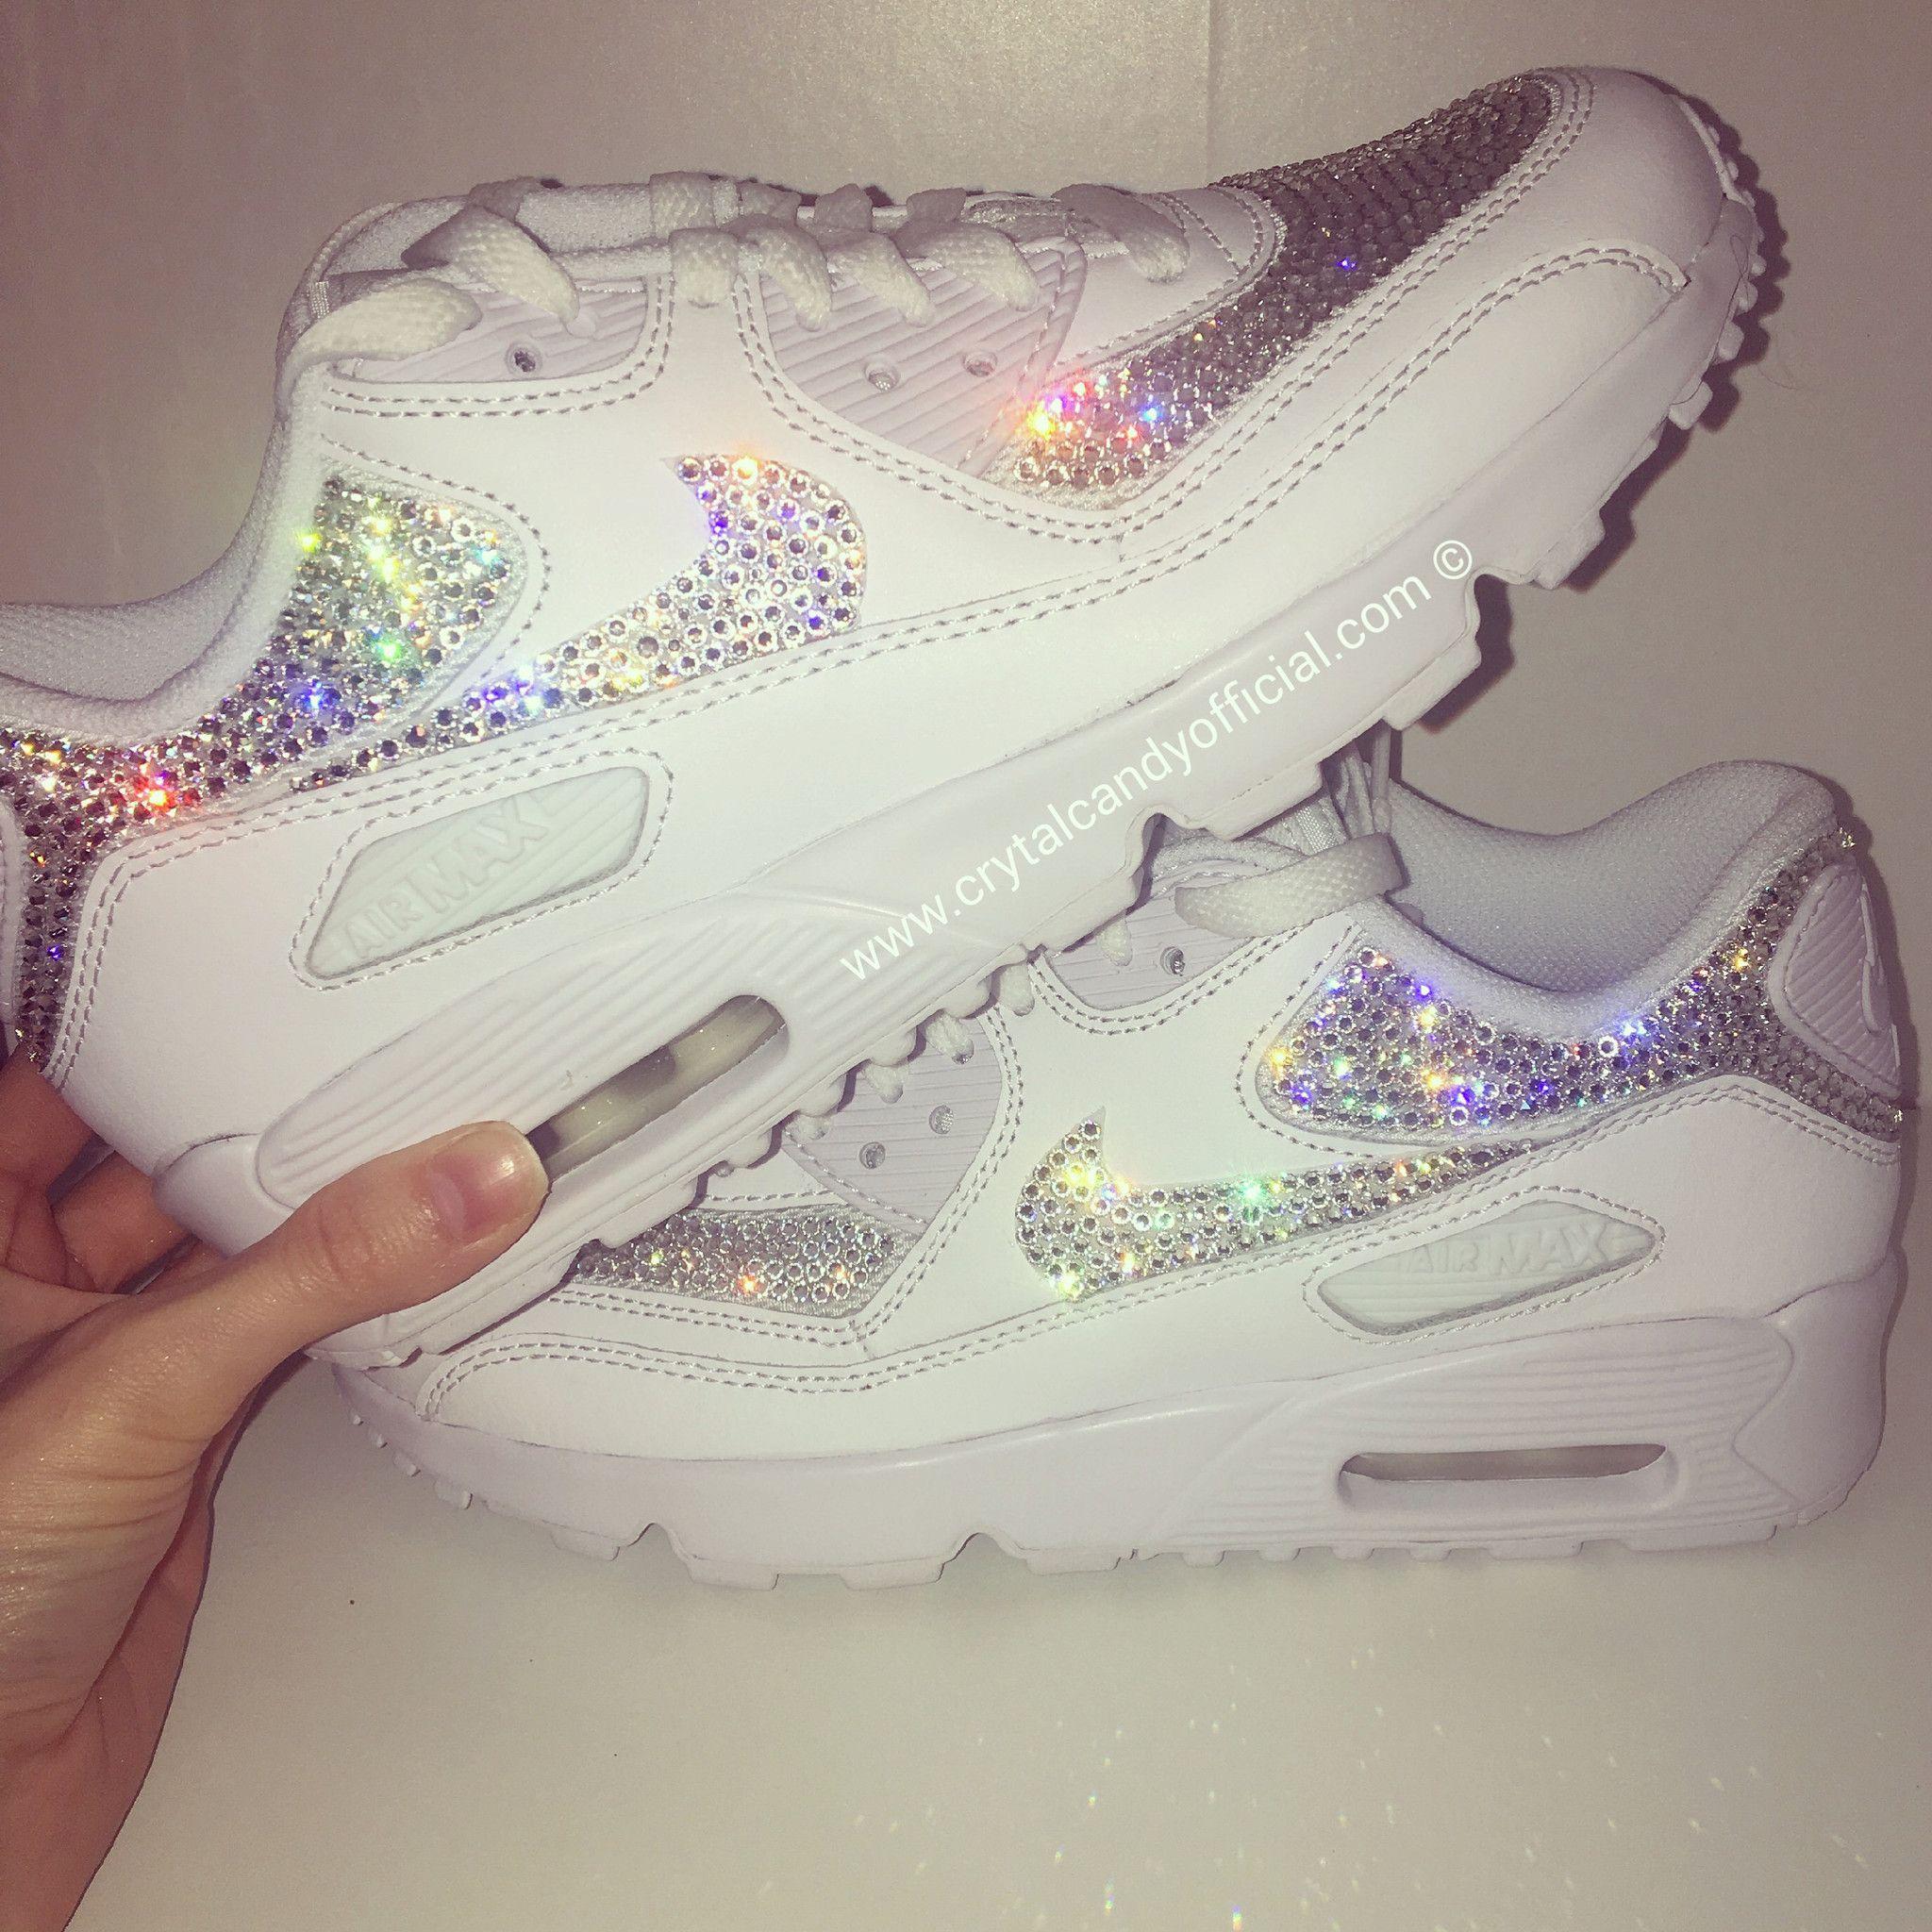 Crystal Nike Air Max 90's in White (fully crystallised) in